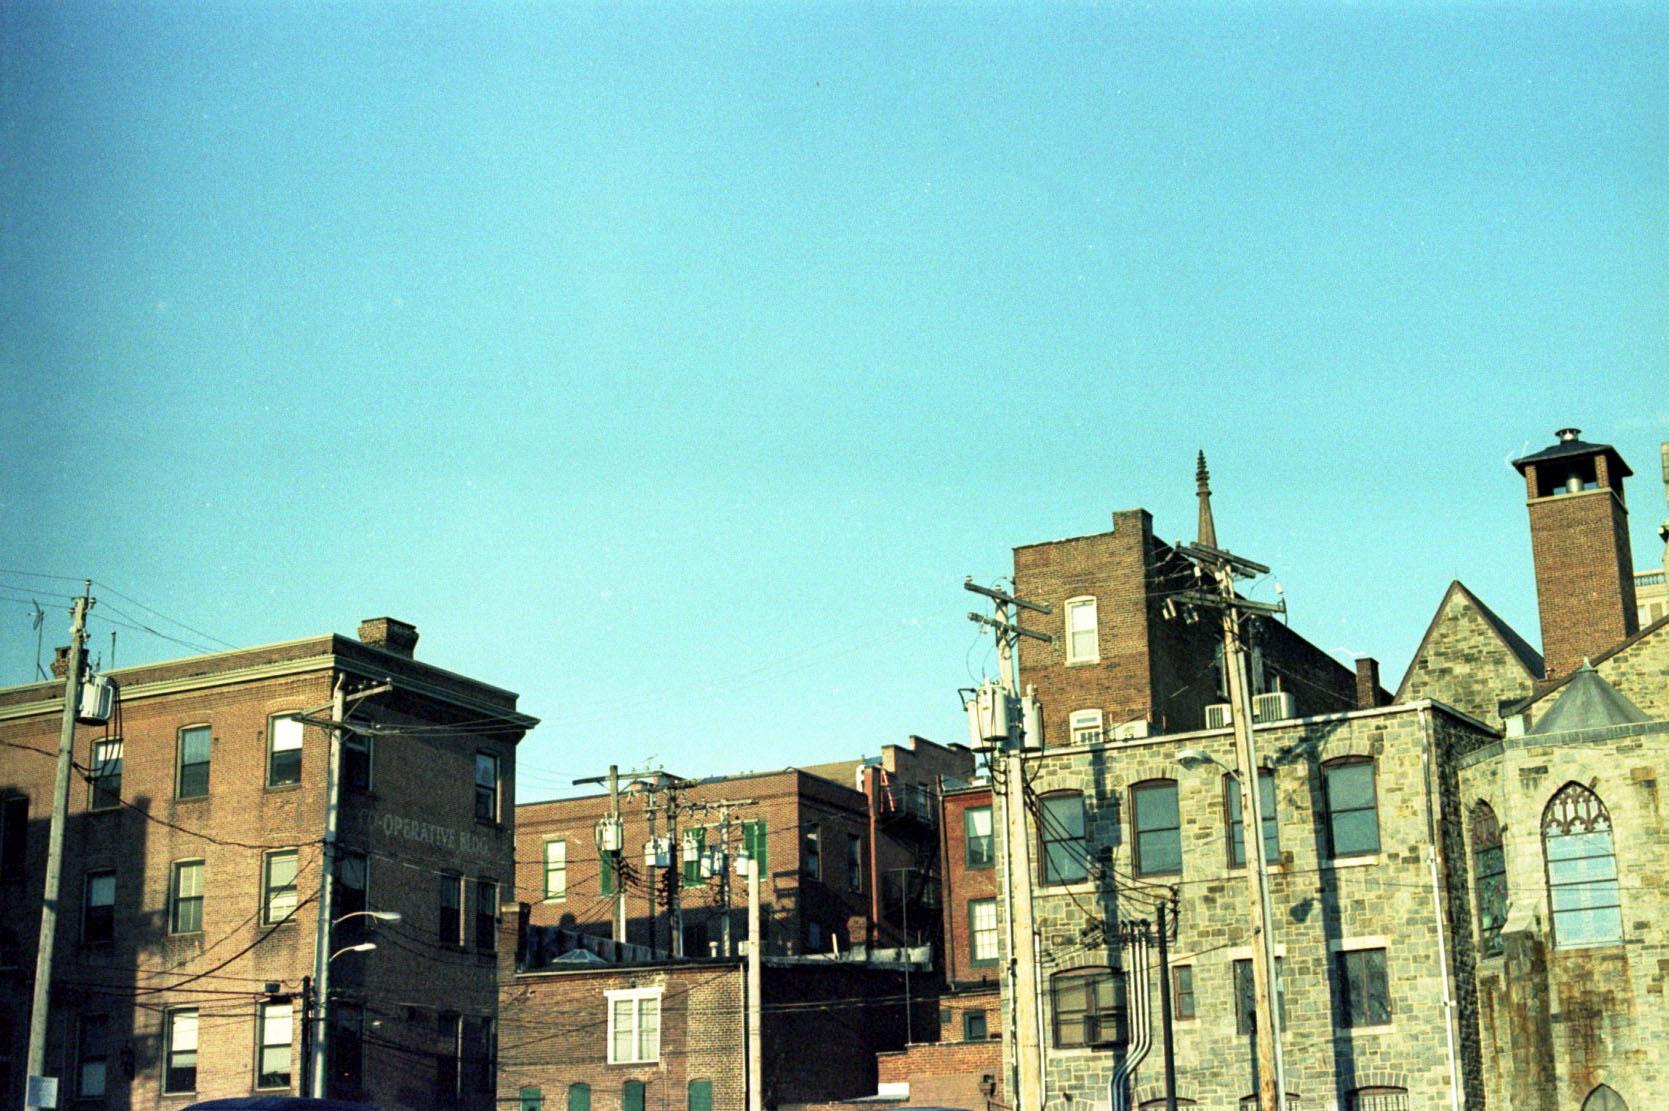 rooftops_28486262173_o.jpg